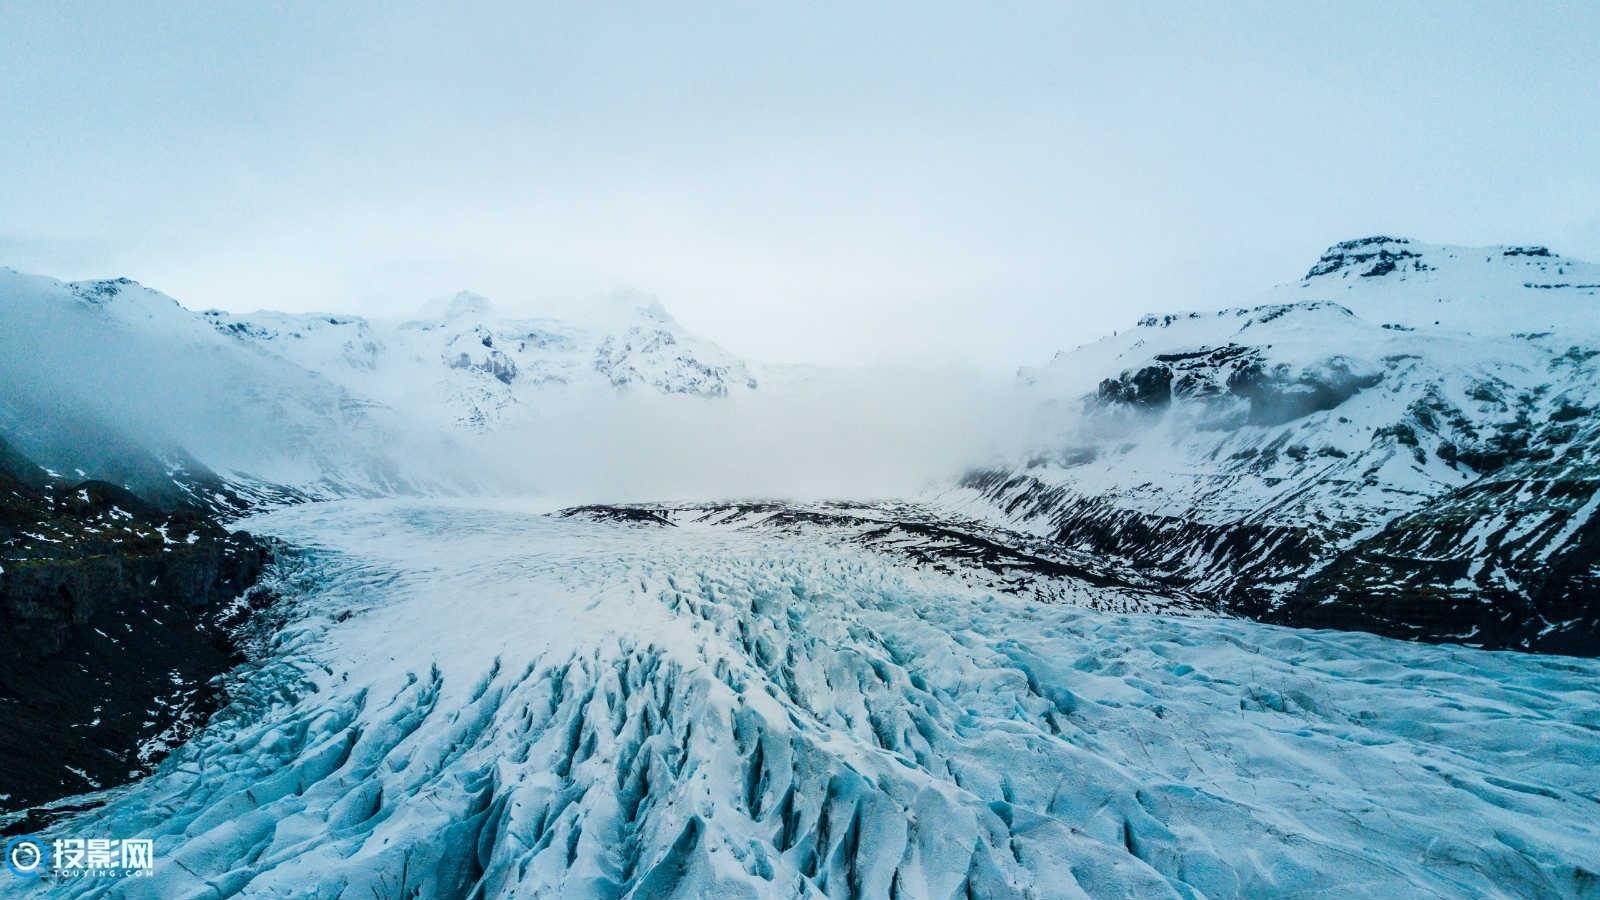 5K 好看的雪山雪景图片8P [分辨率5120x2880x23.5MB]